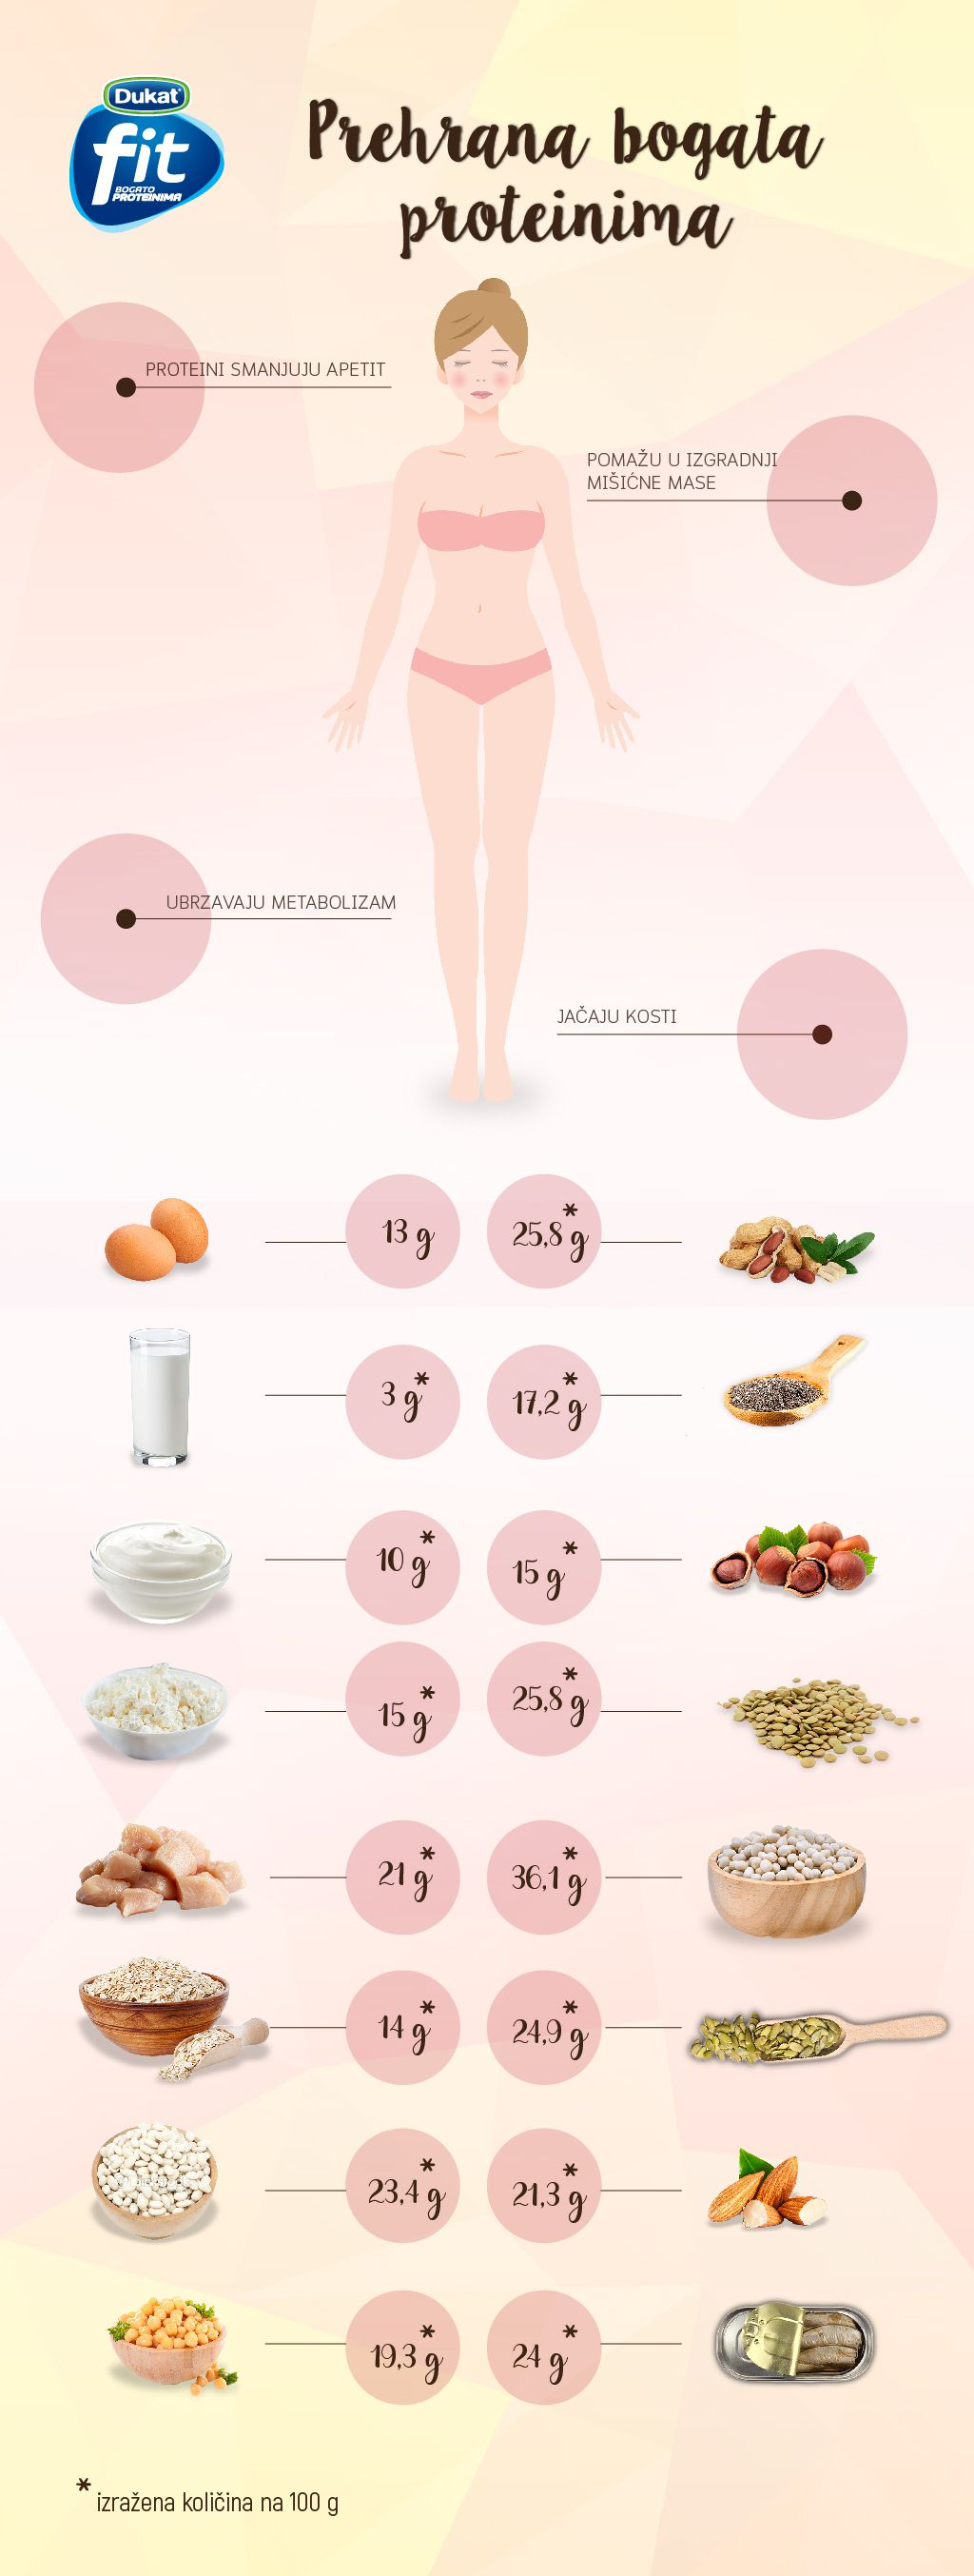 Prehrana bogata proteinima